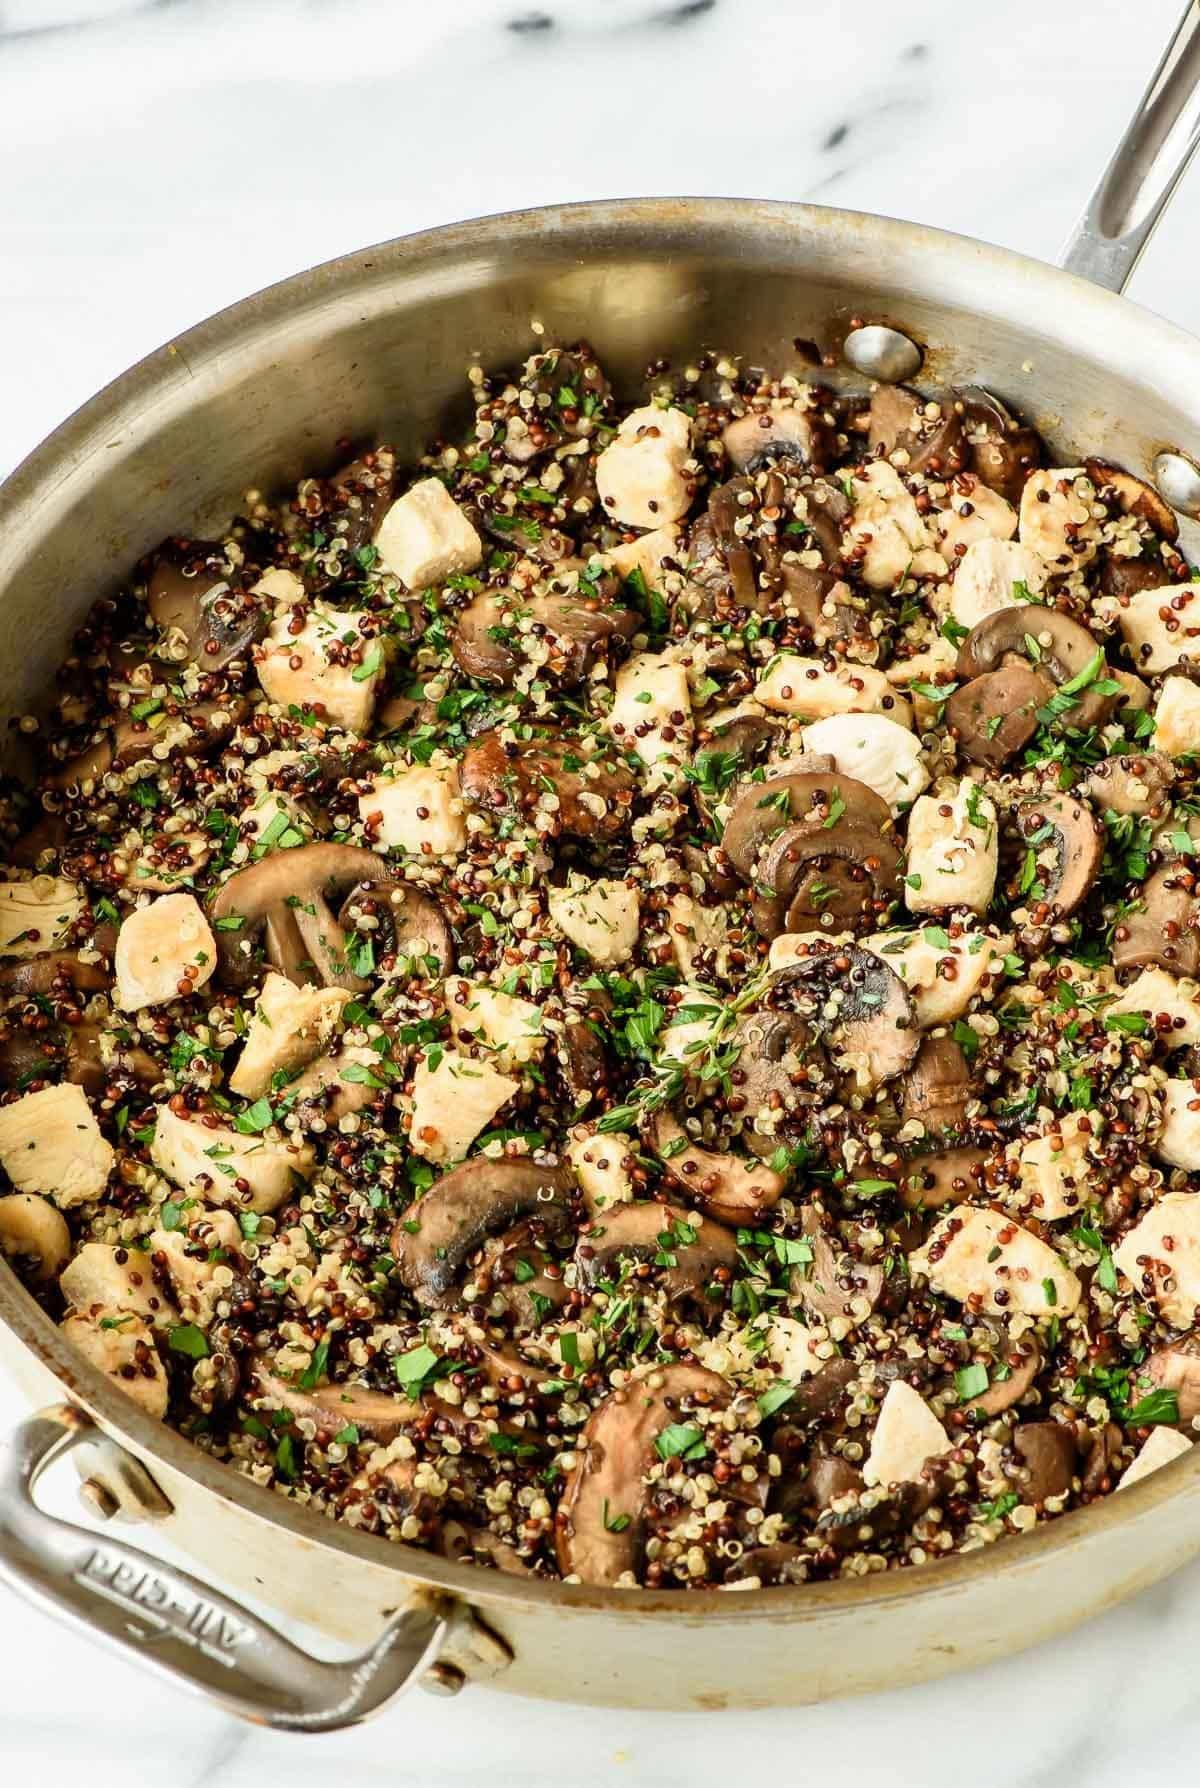 Chicken And Quinoa Recipe Healthy  Skillet Mushroom Chicken and Quinoa Recipe